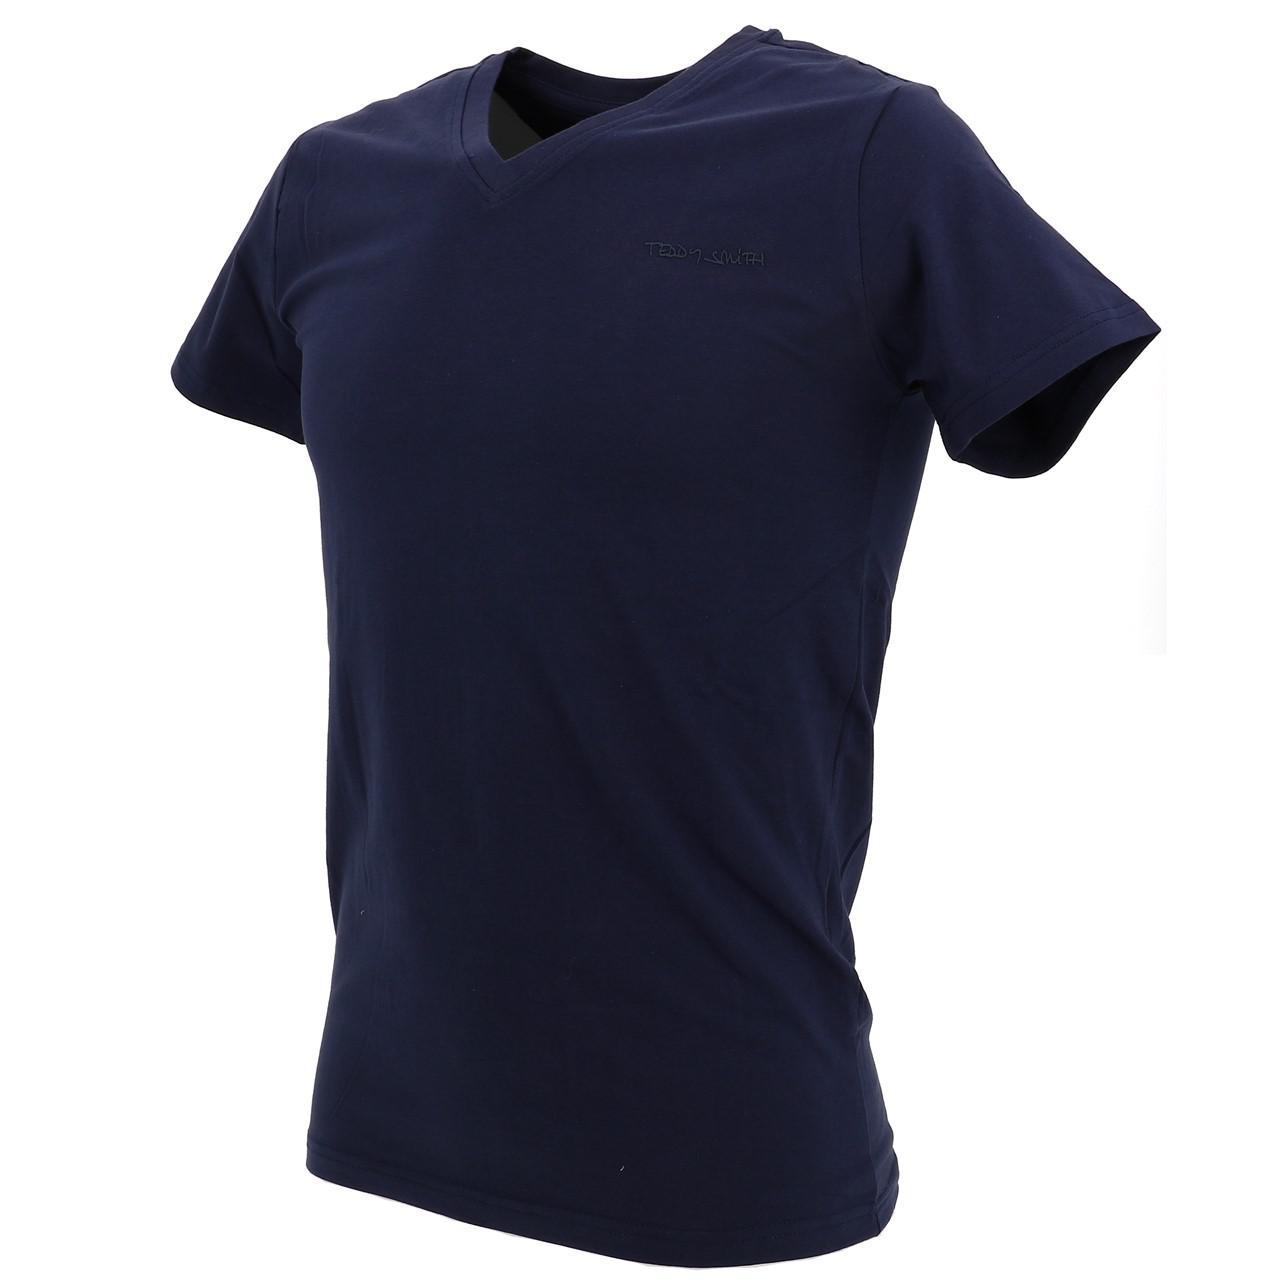 Short-Sleeve-T-Shirt-Teddy-Smith-Tawax-US-Navy-Mc-Tee-Blue-18153-New thumbnail 4